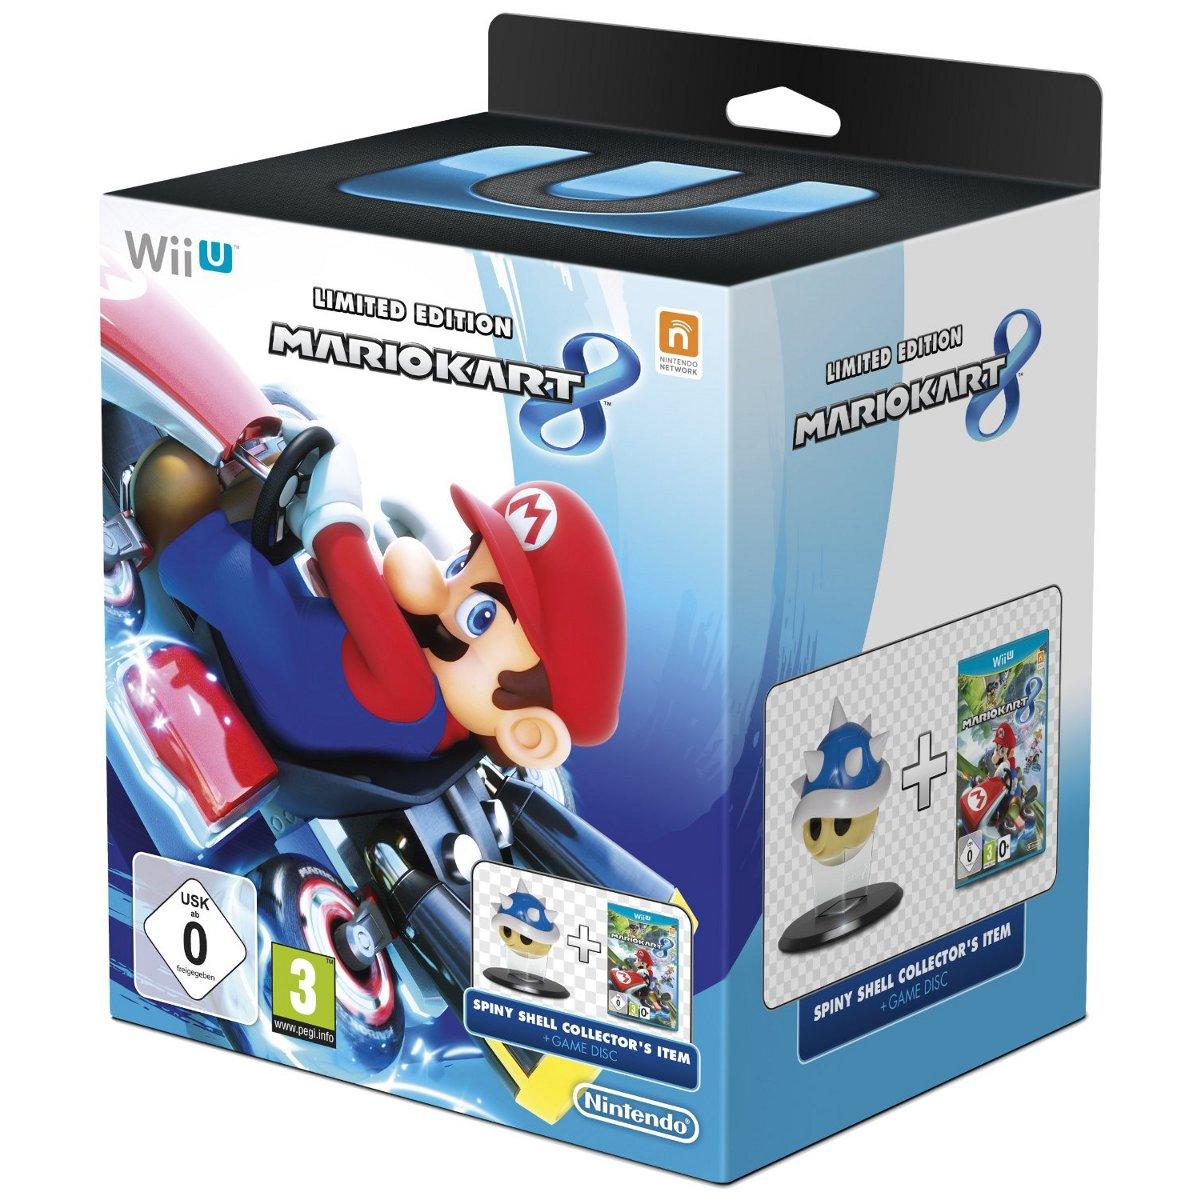 LDLC.com Mario Kart 8 Limited Edition (Wii U) Mario Kart 8 Limited Edition (Wii U)